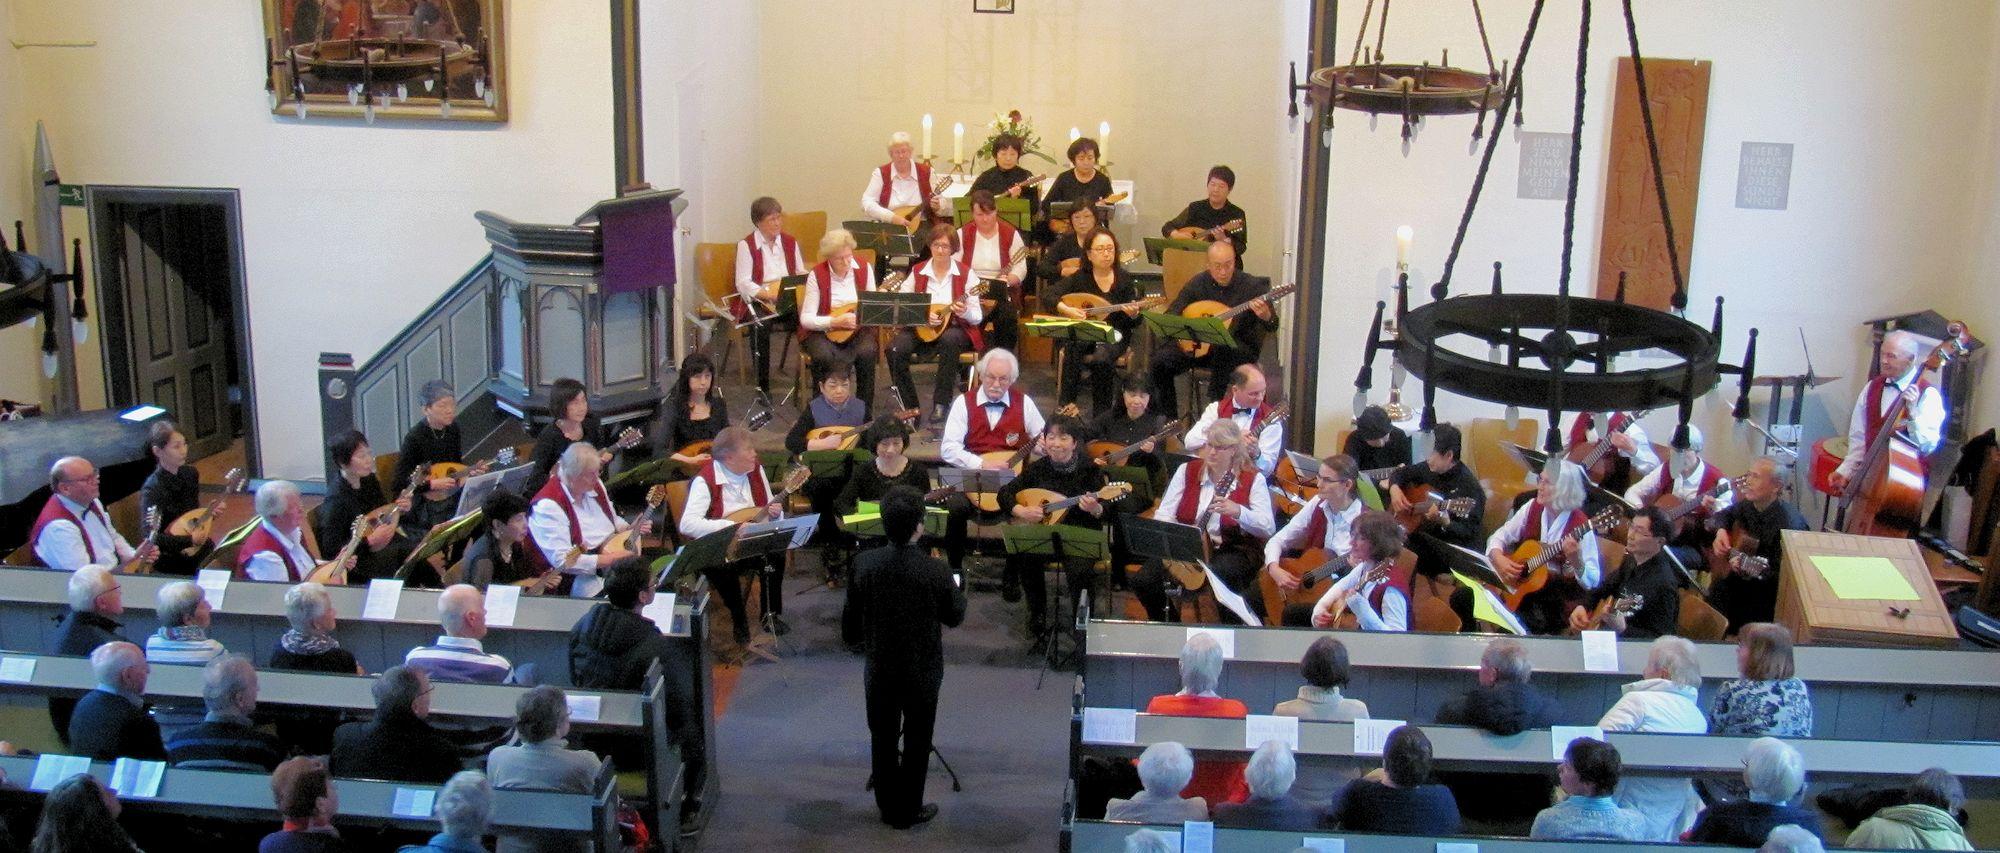 Mandolinenclub Ellerbek und Shizuoka Mandolin Society